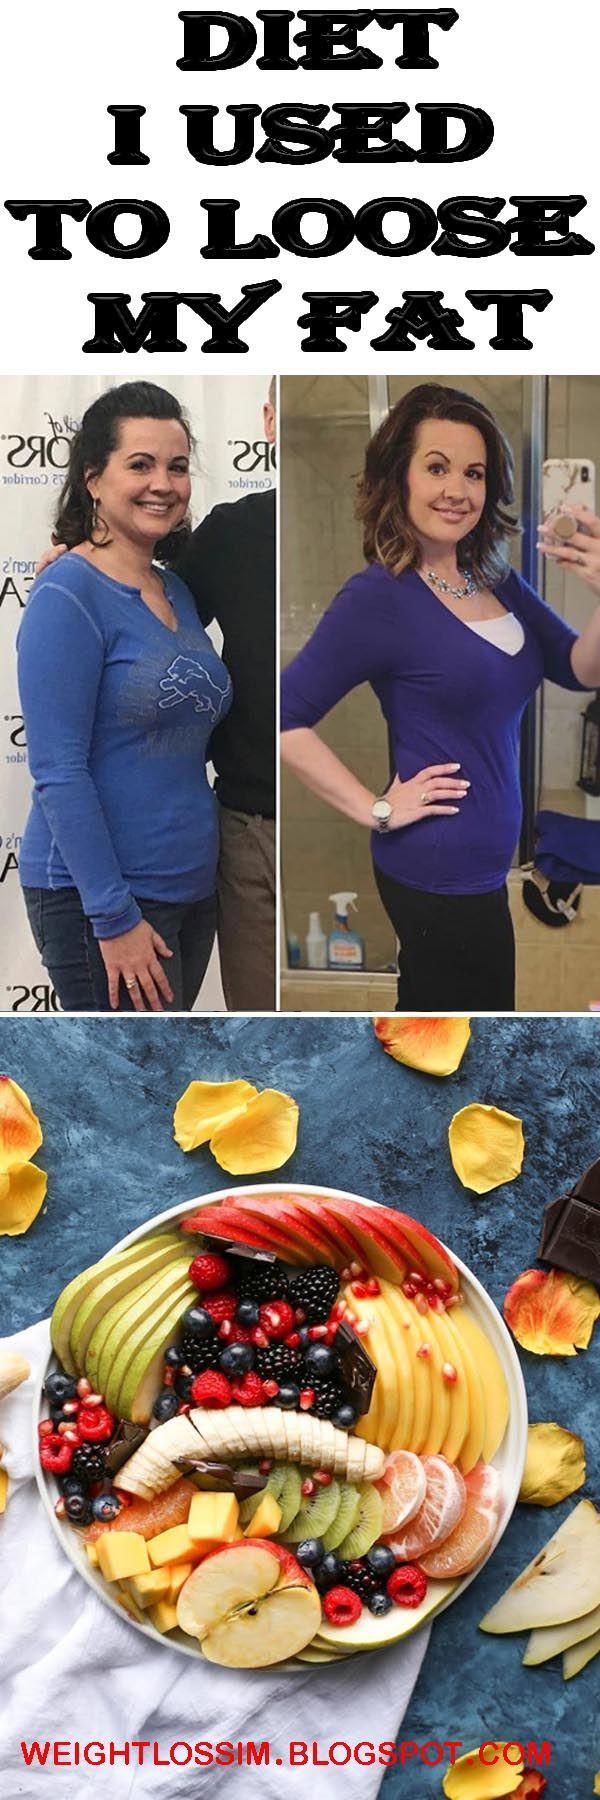 Strict Vegan Diet Plan  Ve arian Diet Plan With images